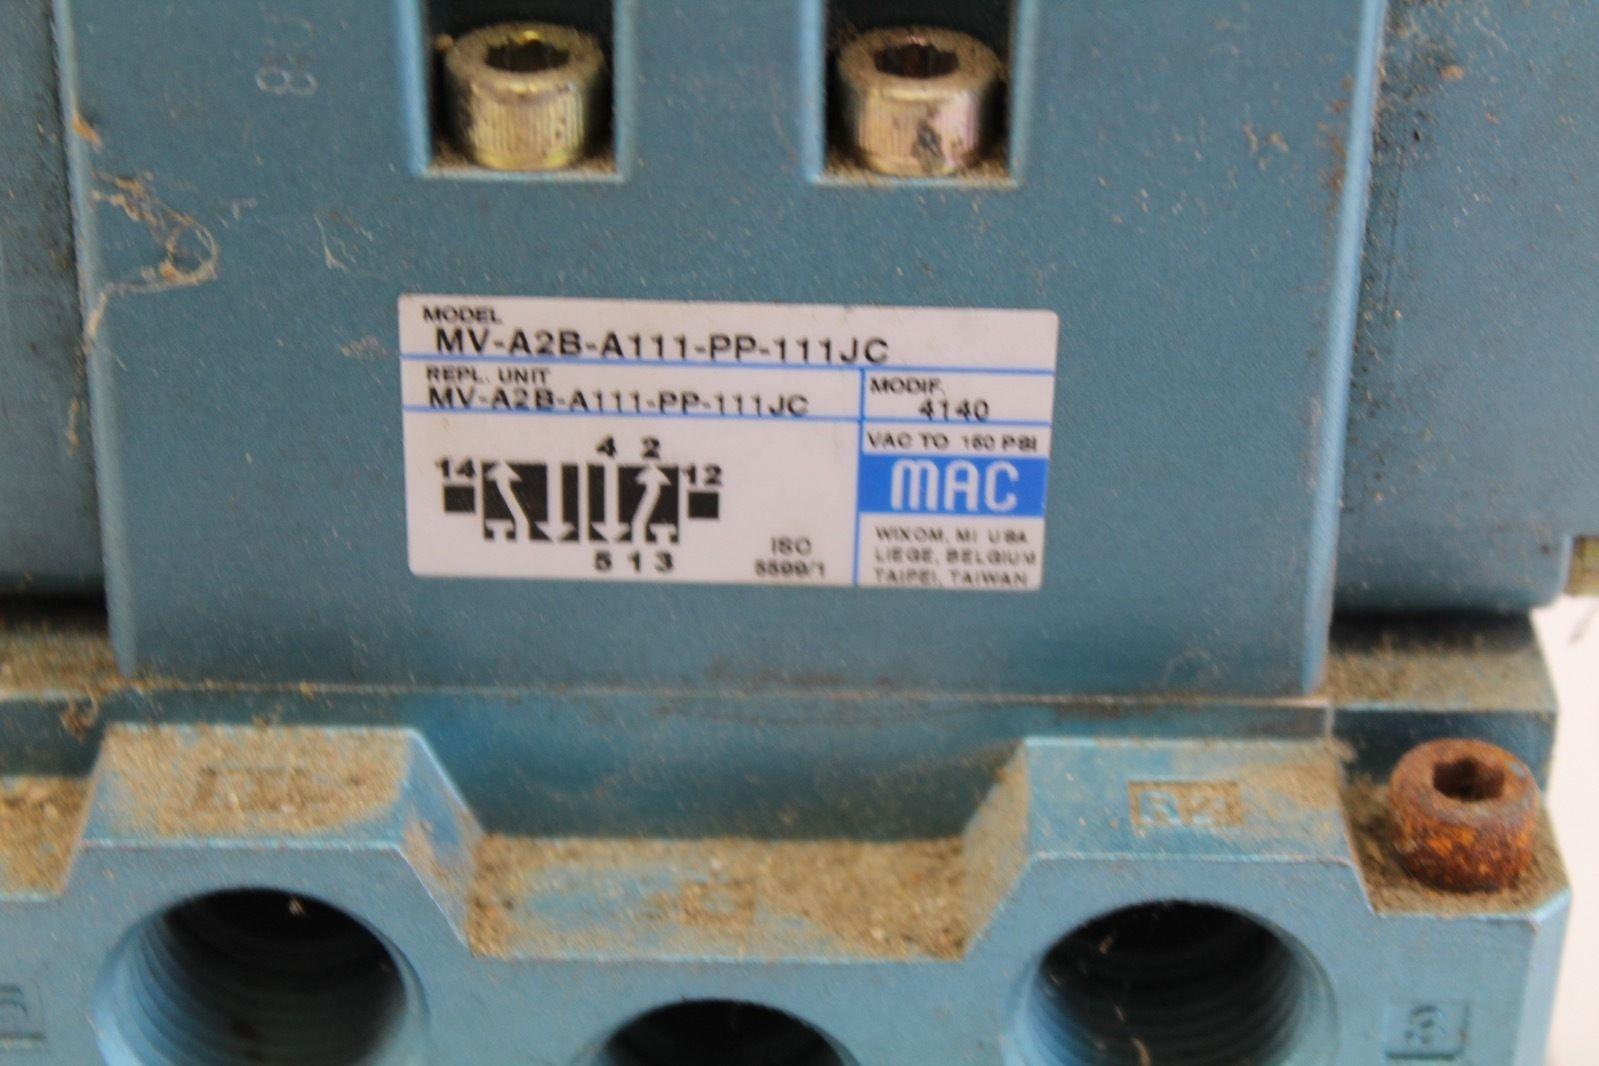 Mac Servo Valve MV-A2B-A111-PP-111JC with connector PPE-111JC *used* (B235) 2